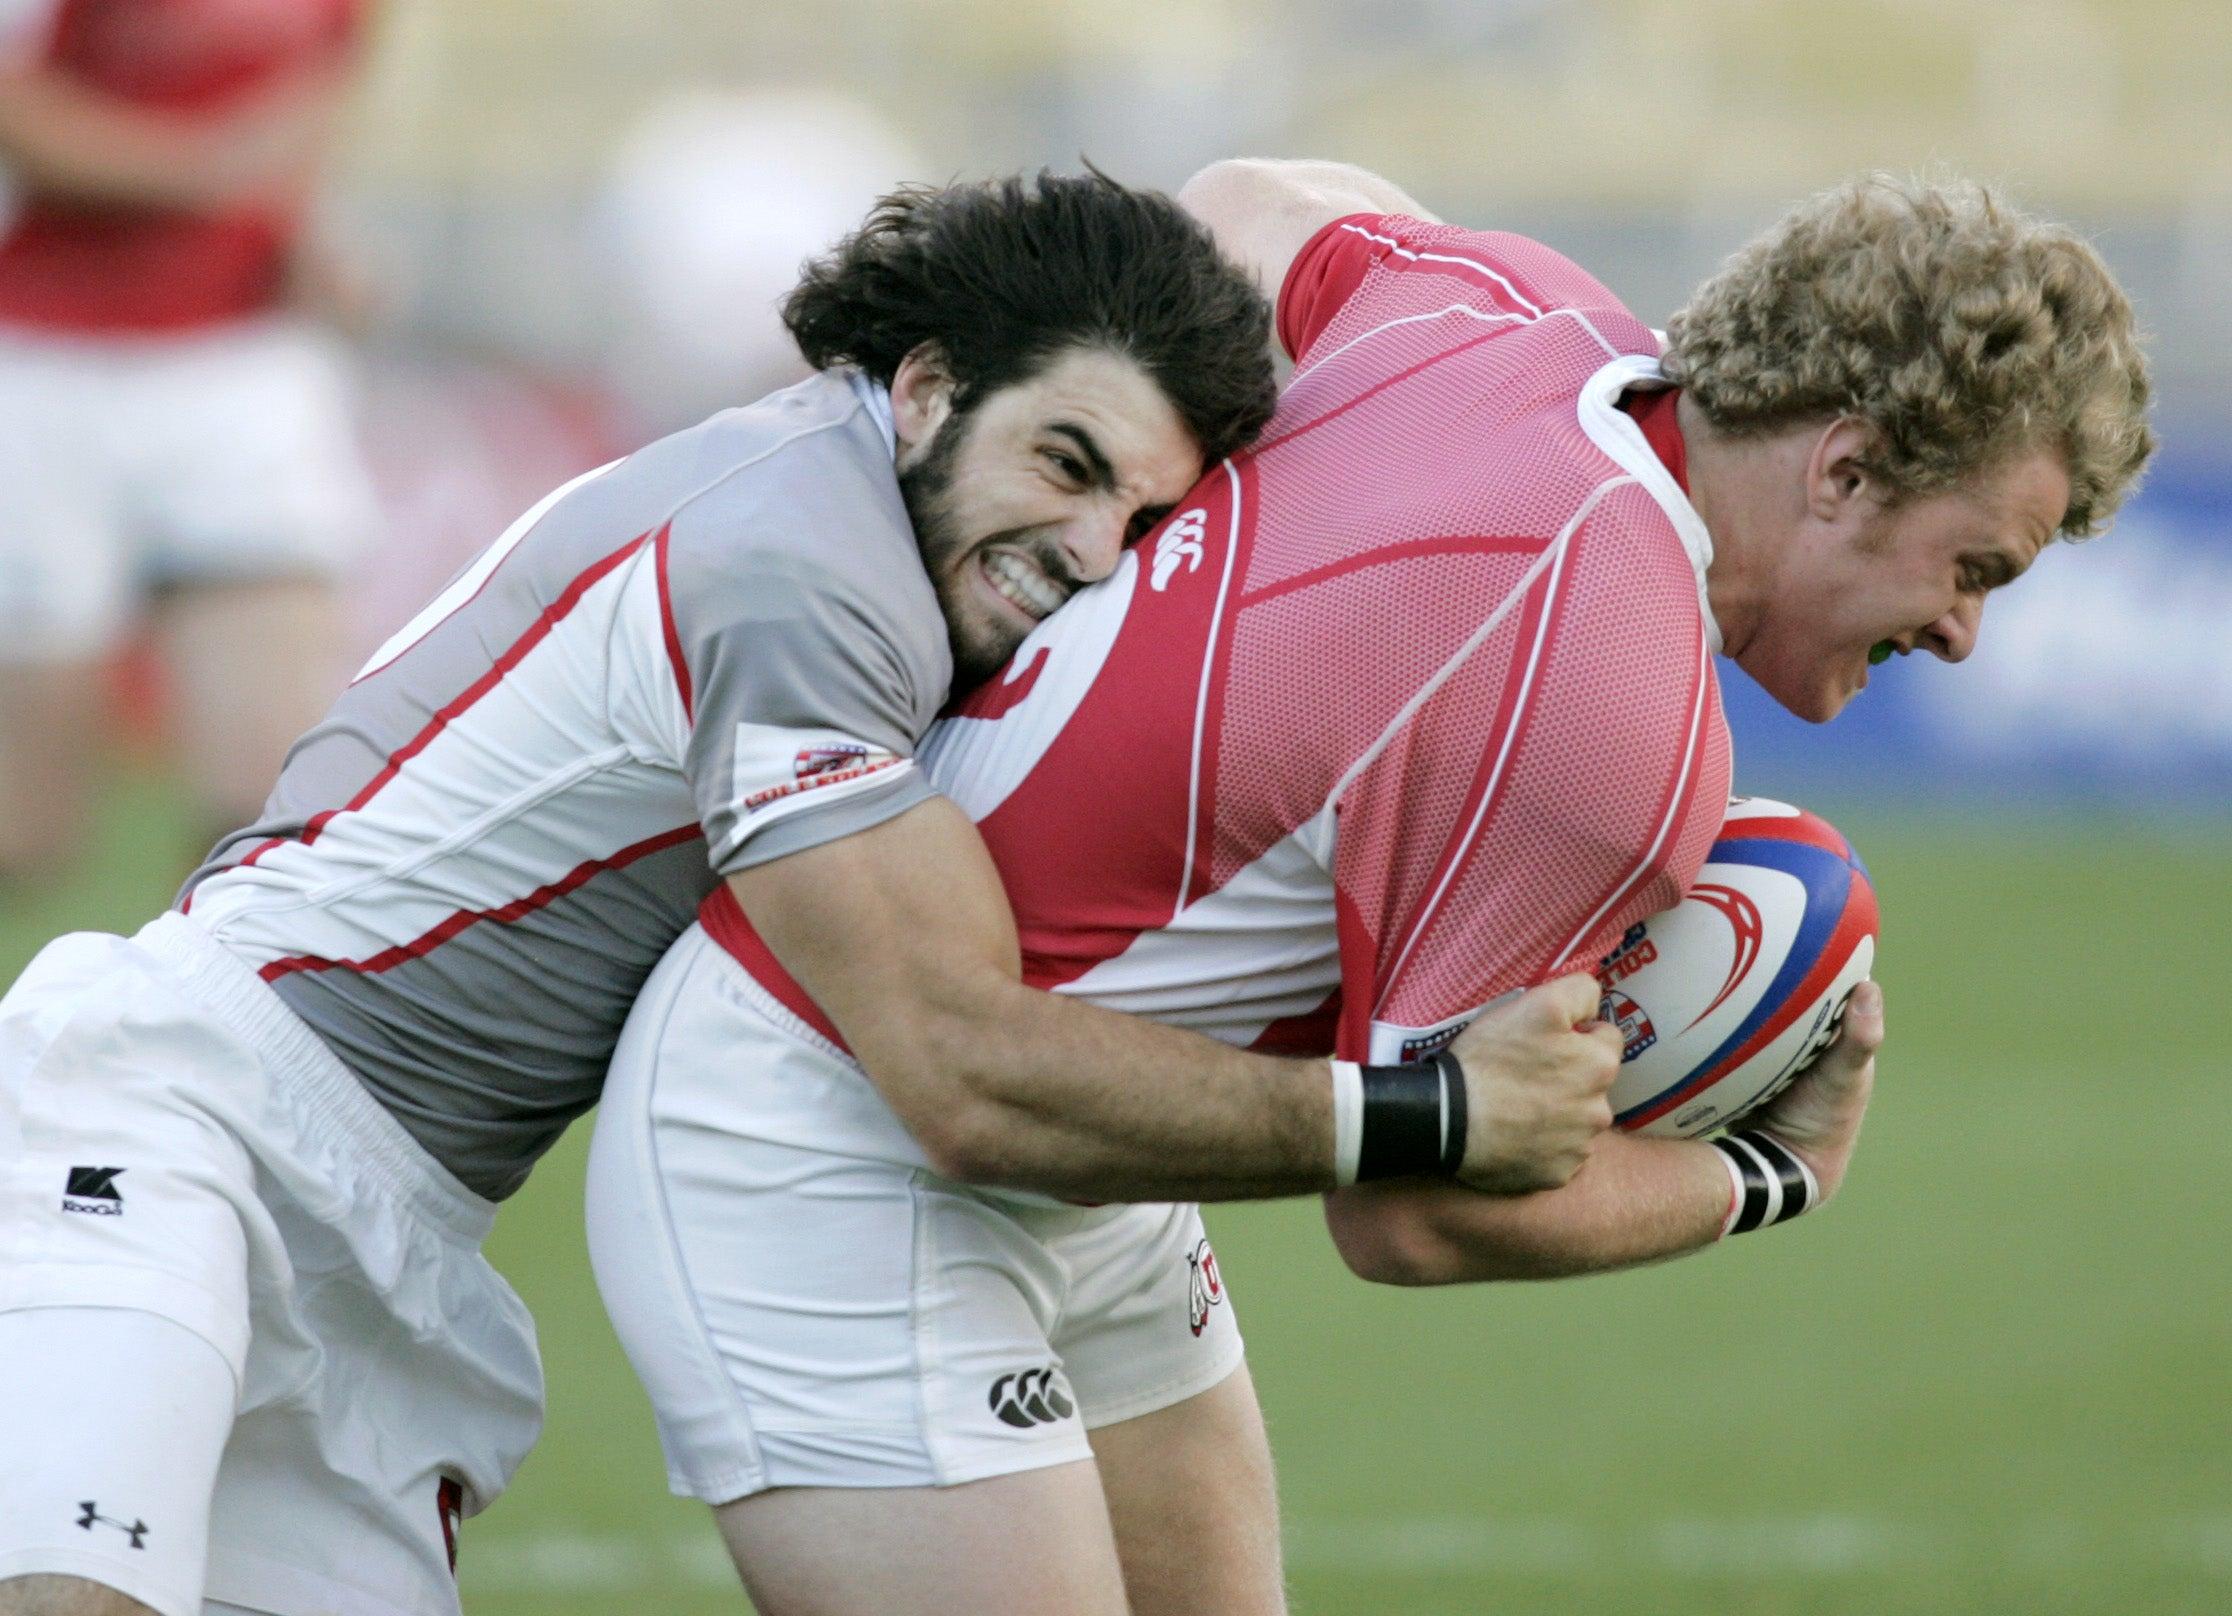 ebner rugby jersey